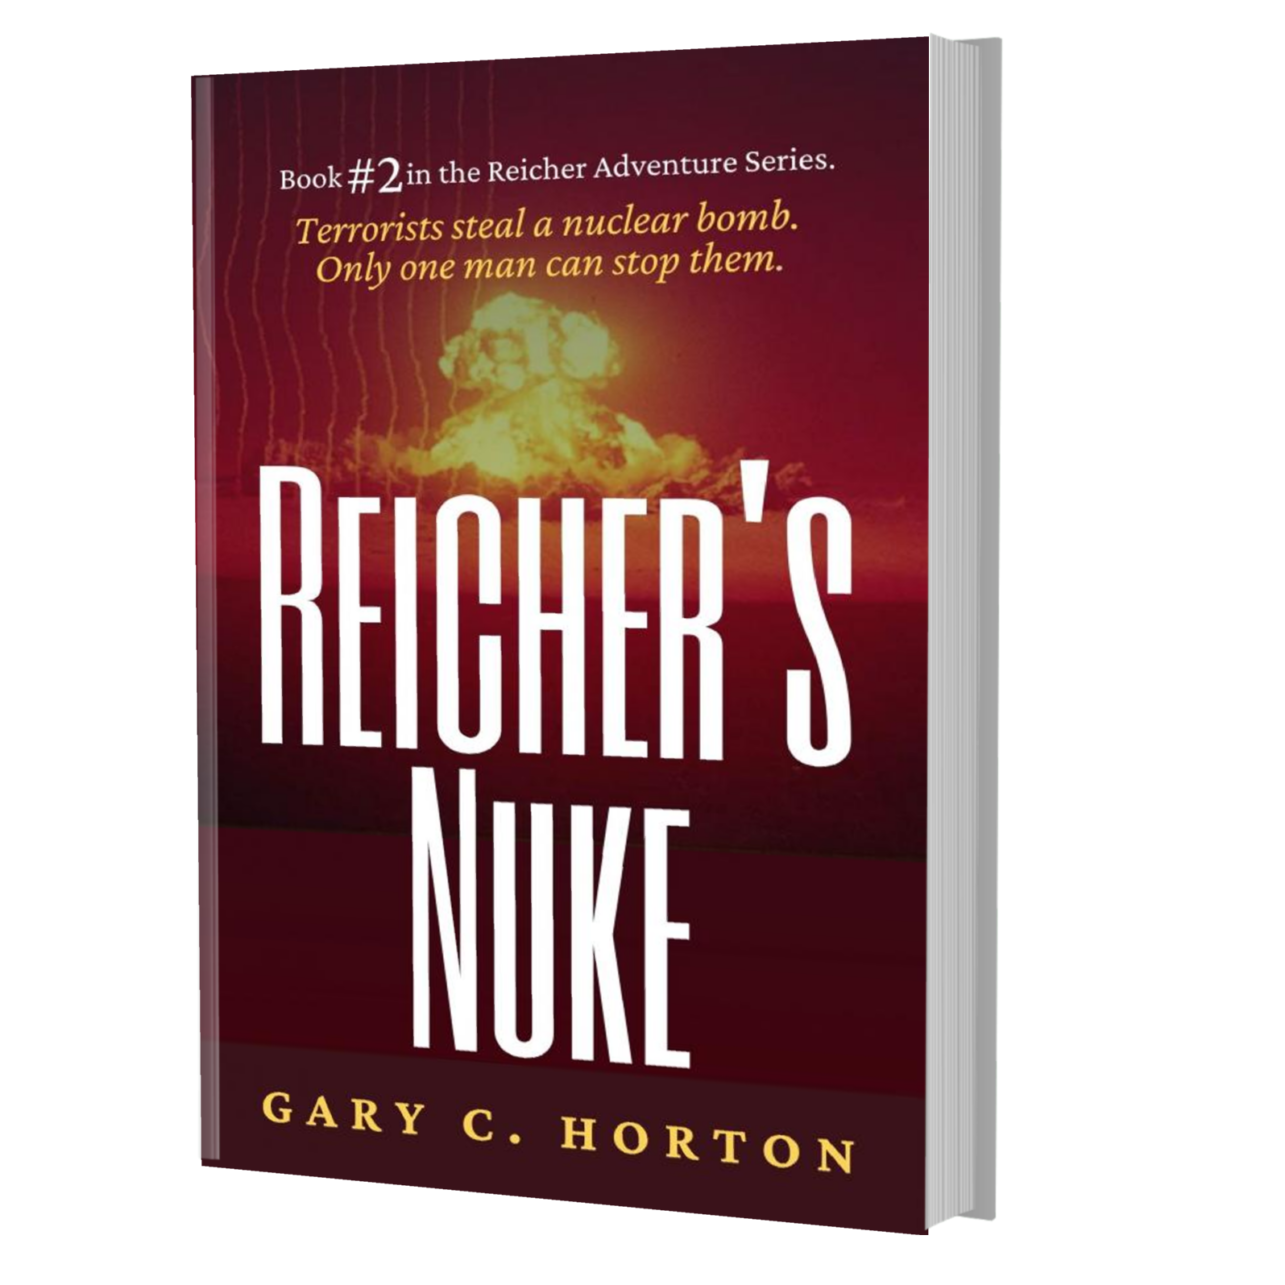 Reicher's Nuke - a novel by Gary C. Horton